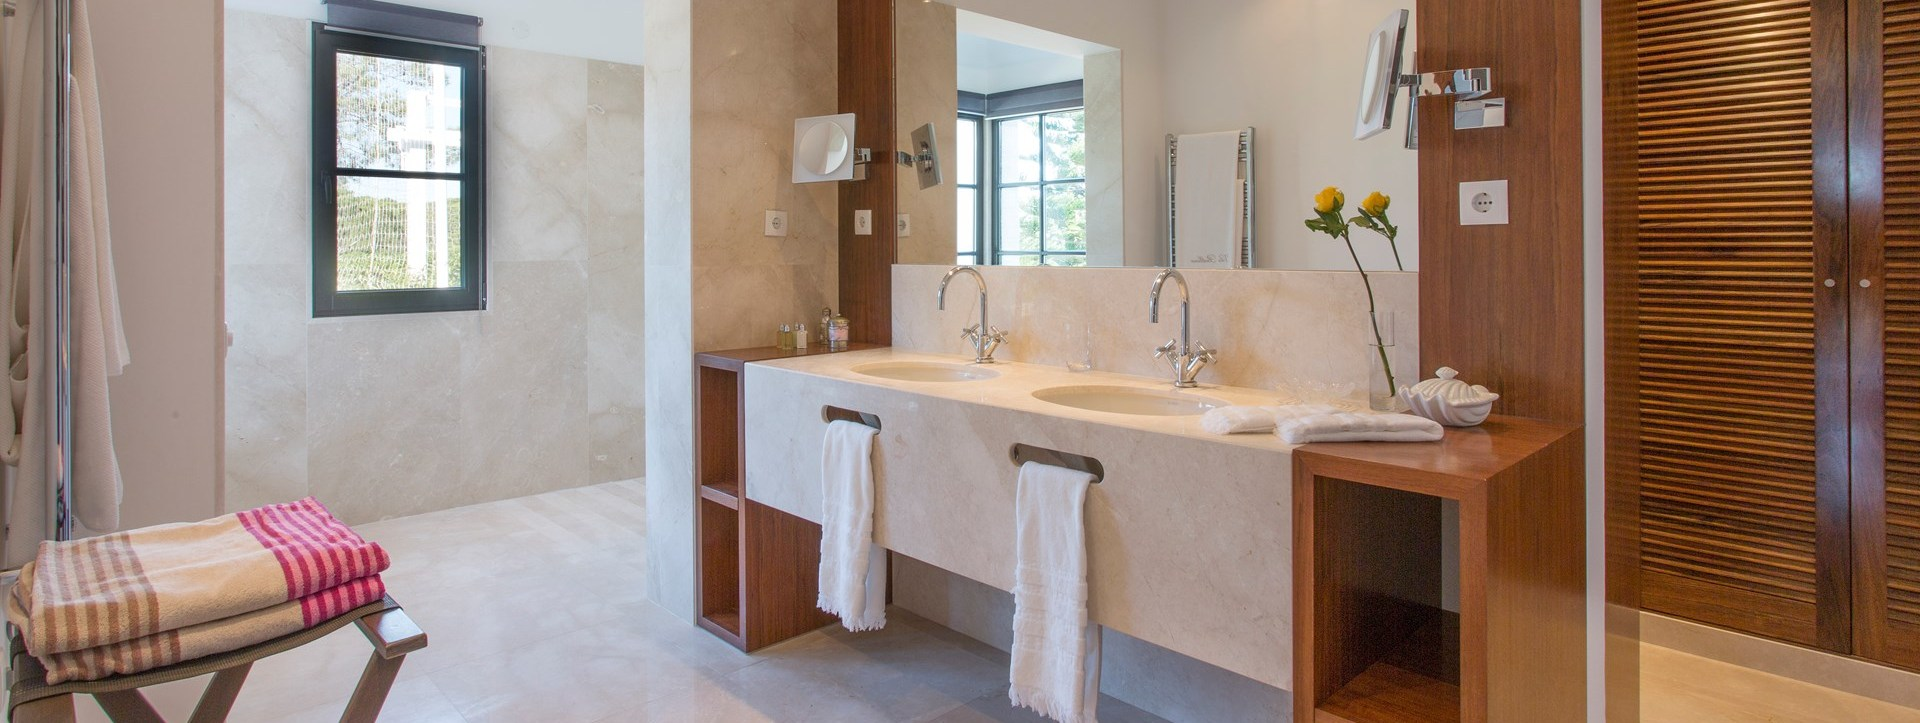 villa-balbina-5-bedrooms-algarve